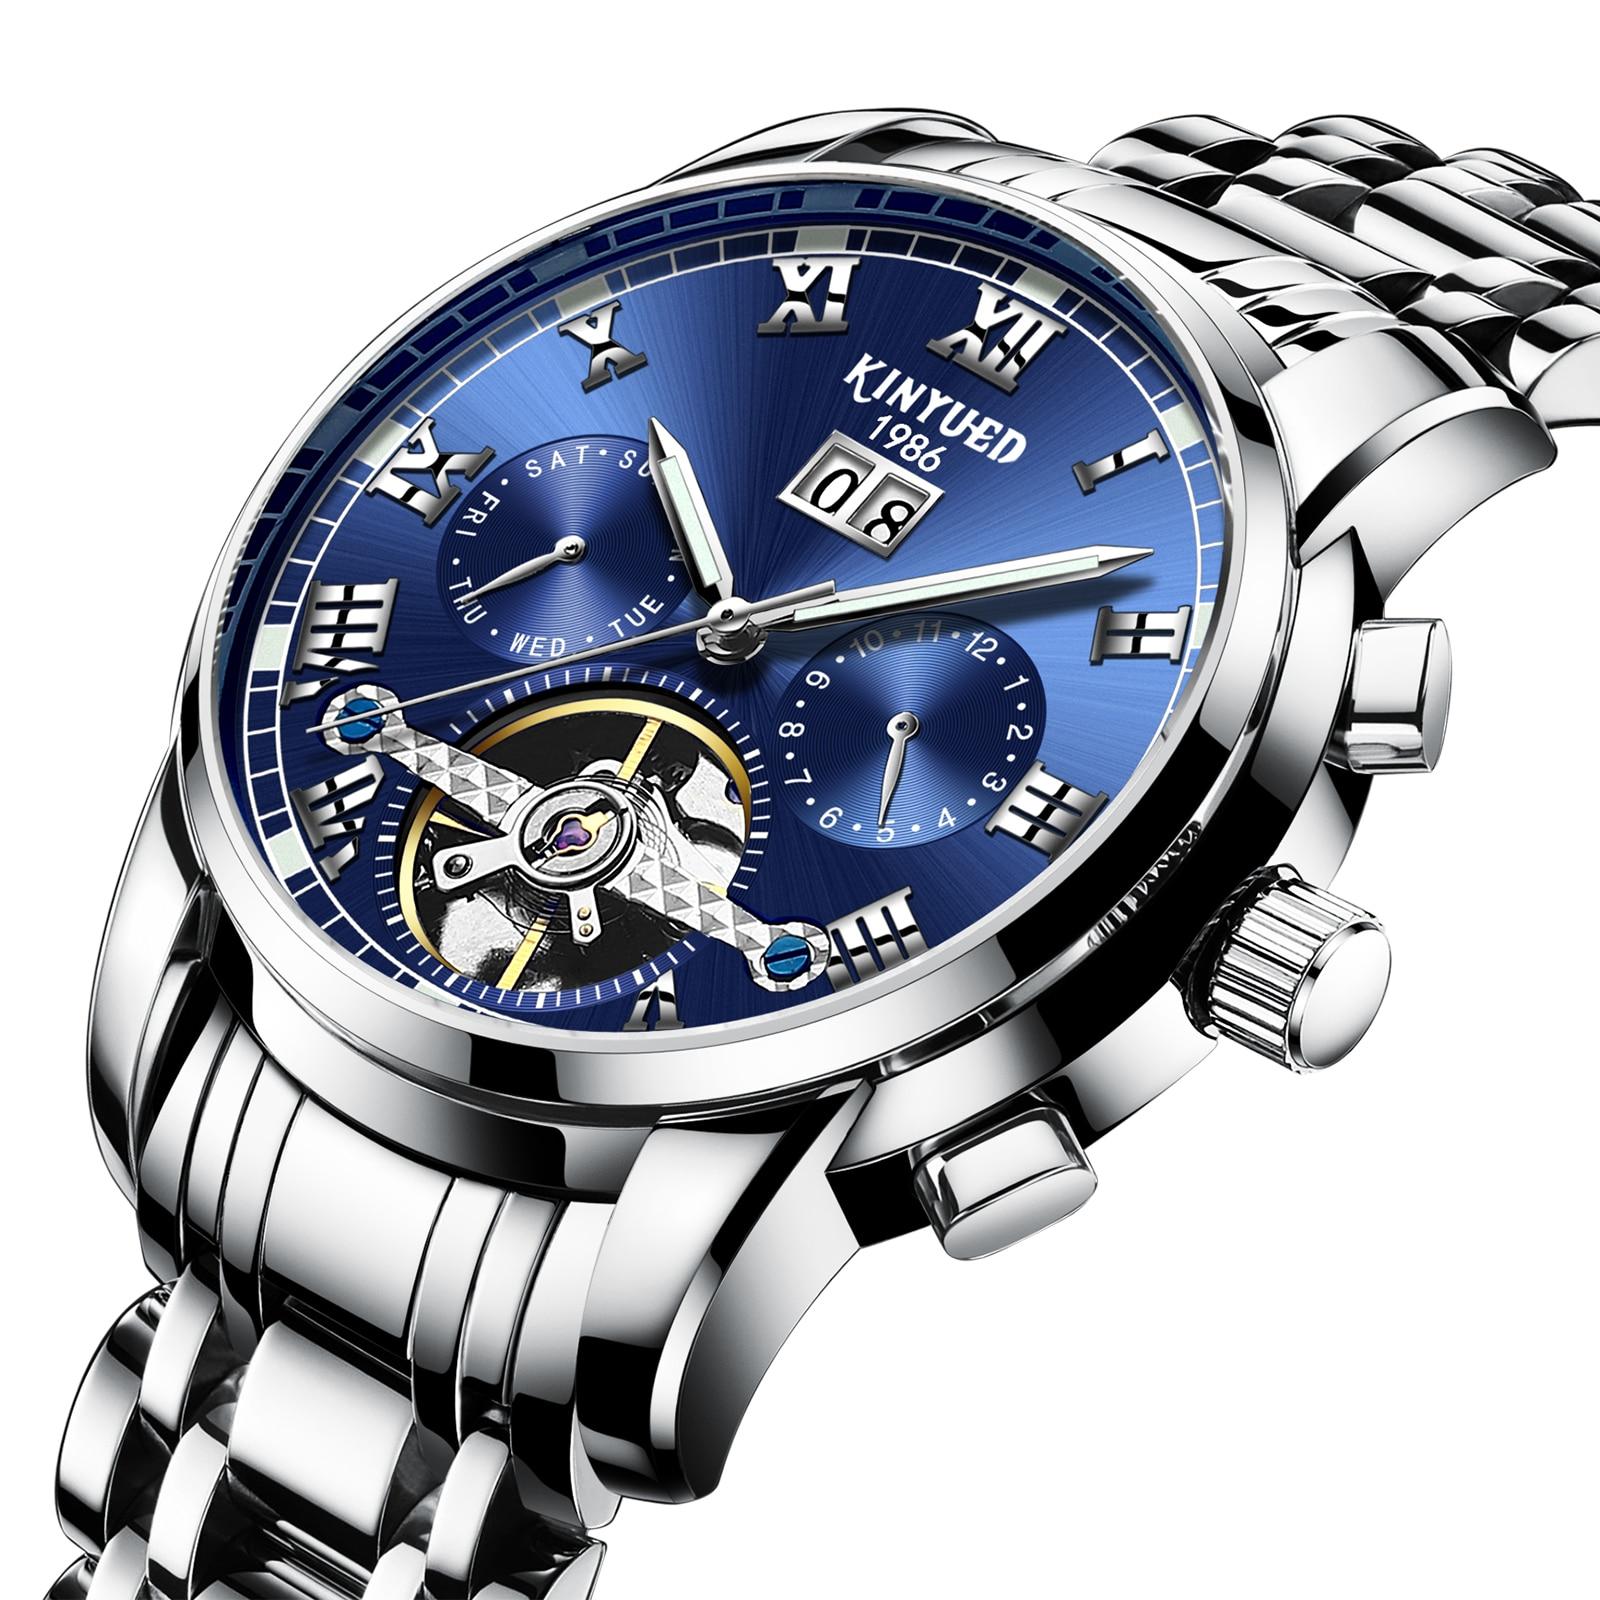 2020 New Fashion Stainless Steel Men's Tourbillon Automatic Mechanical Wrist Watch Men's Gift